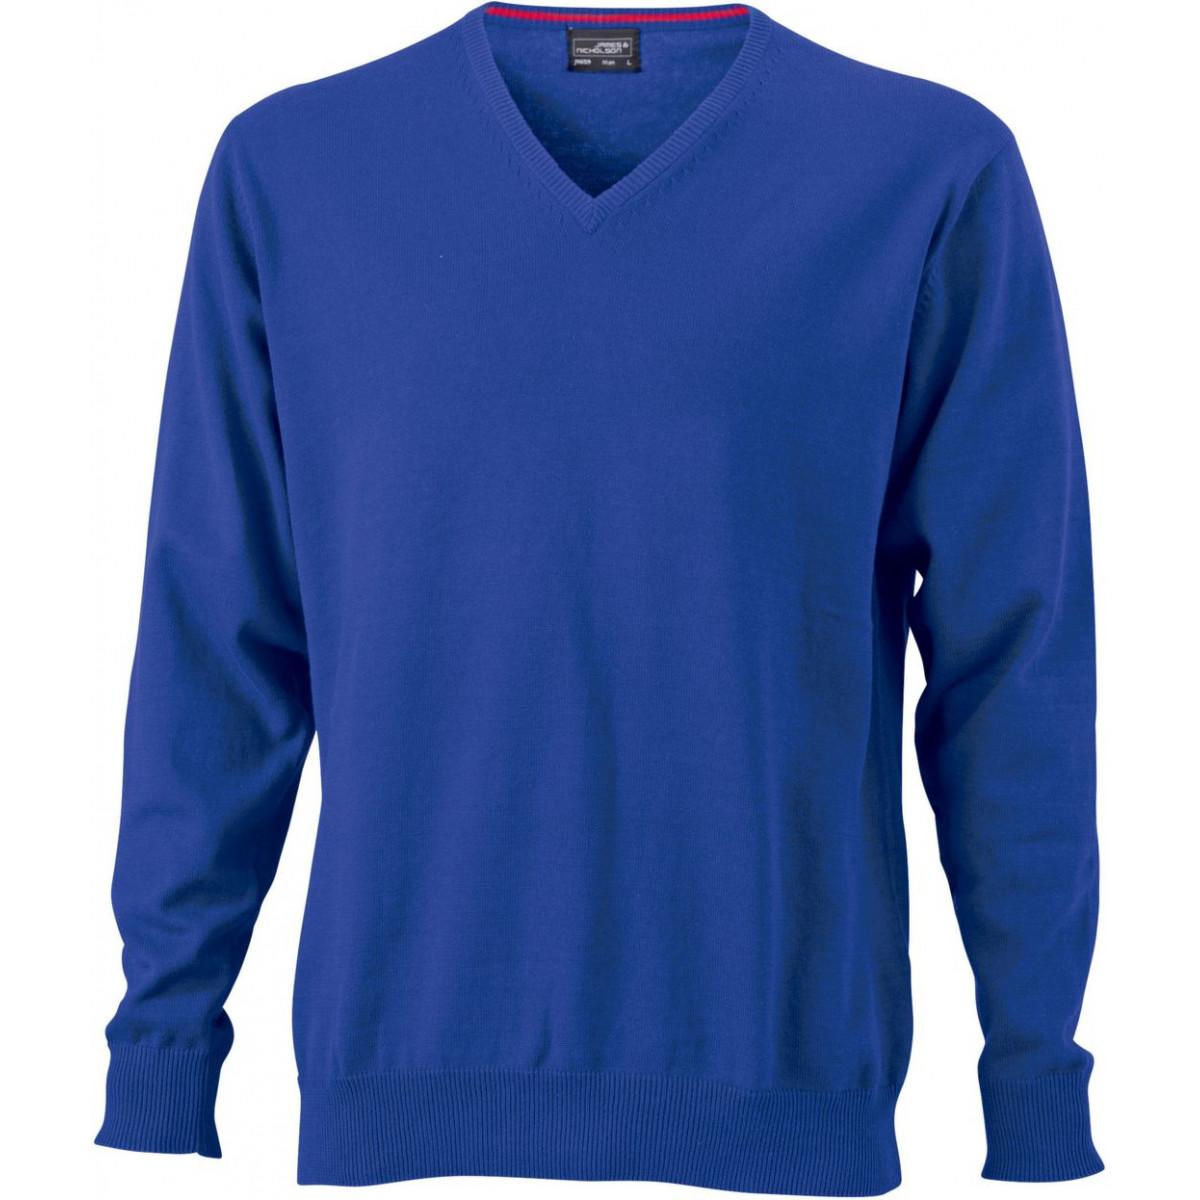 Пуловер мужской JN659 Mens V-Neck Pullover - Ярко-синий